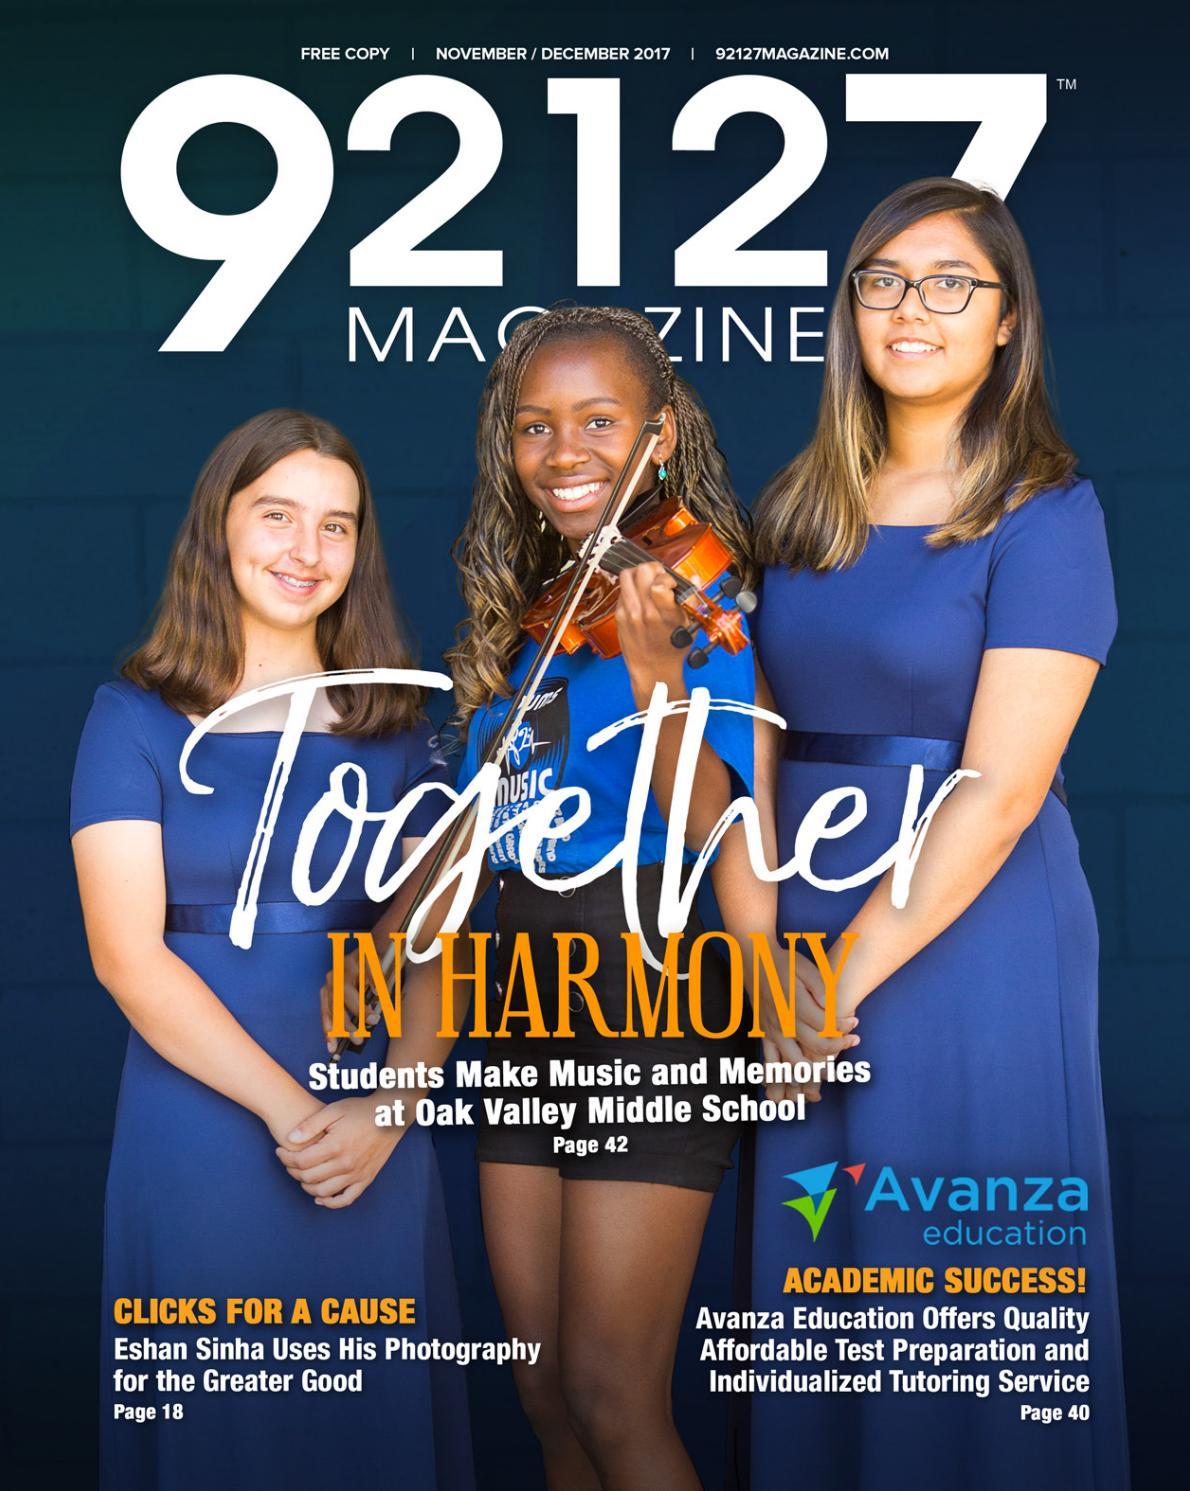 92127 Magazine - November/December 2017 by ZCode Magazines